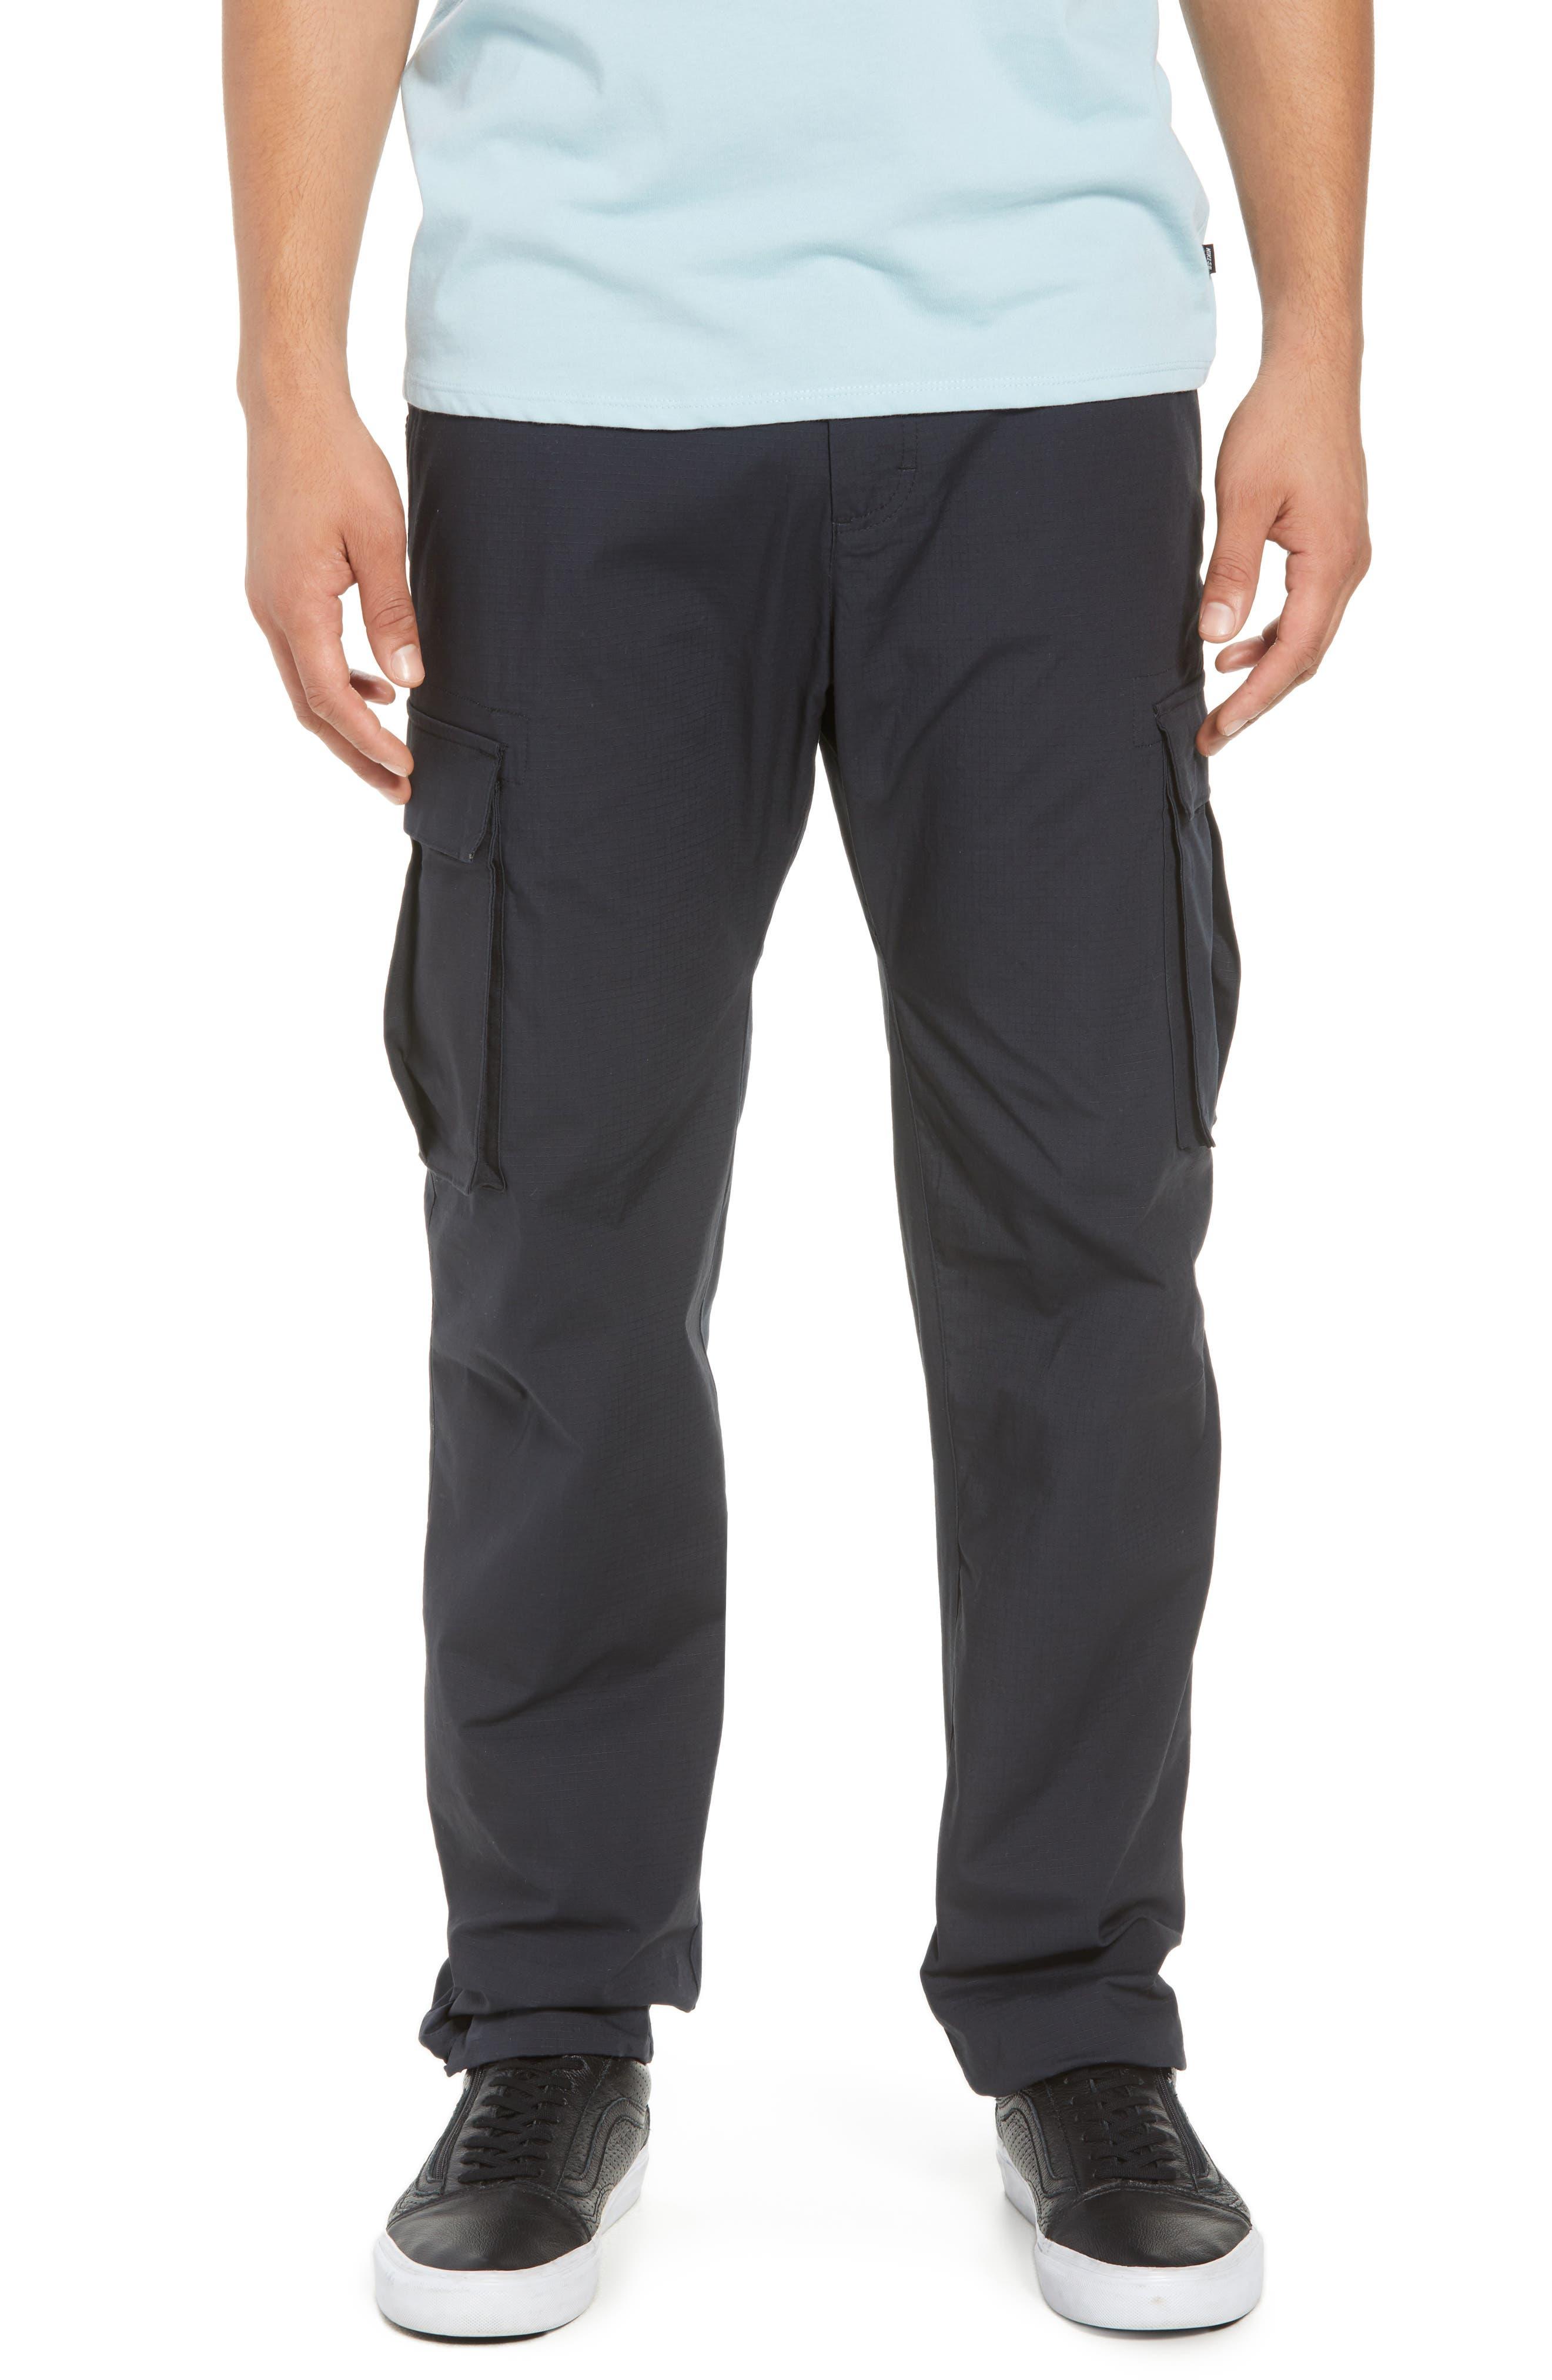 Nike Sb Flex Cargo Pants, Black